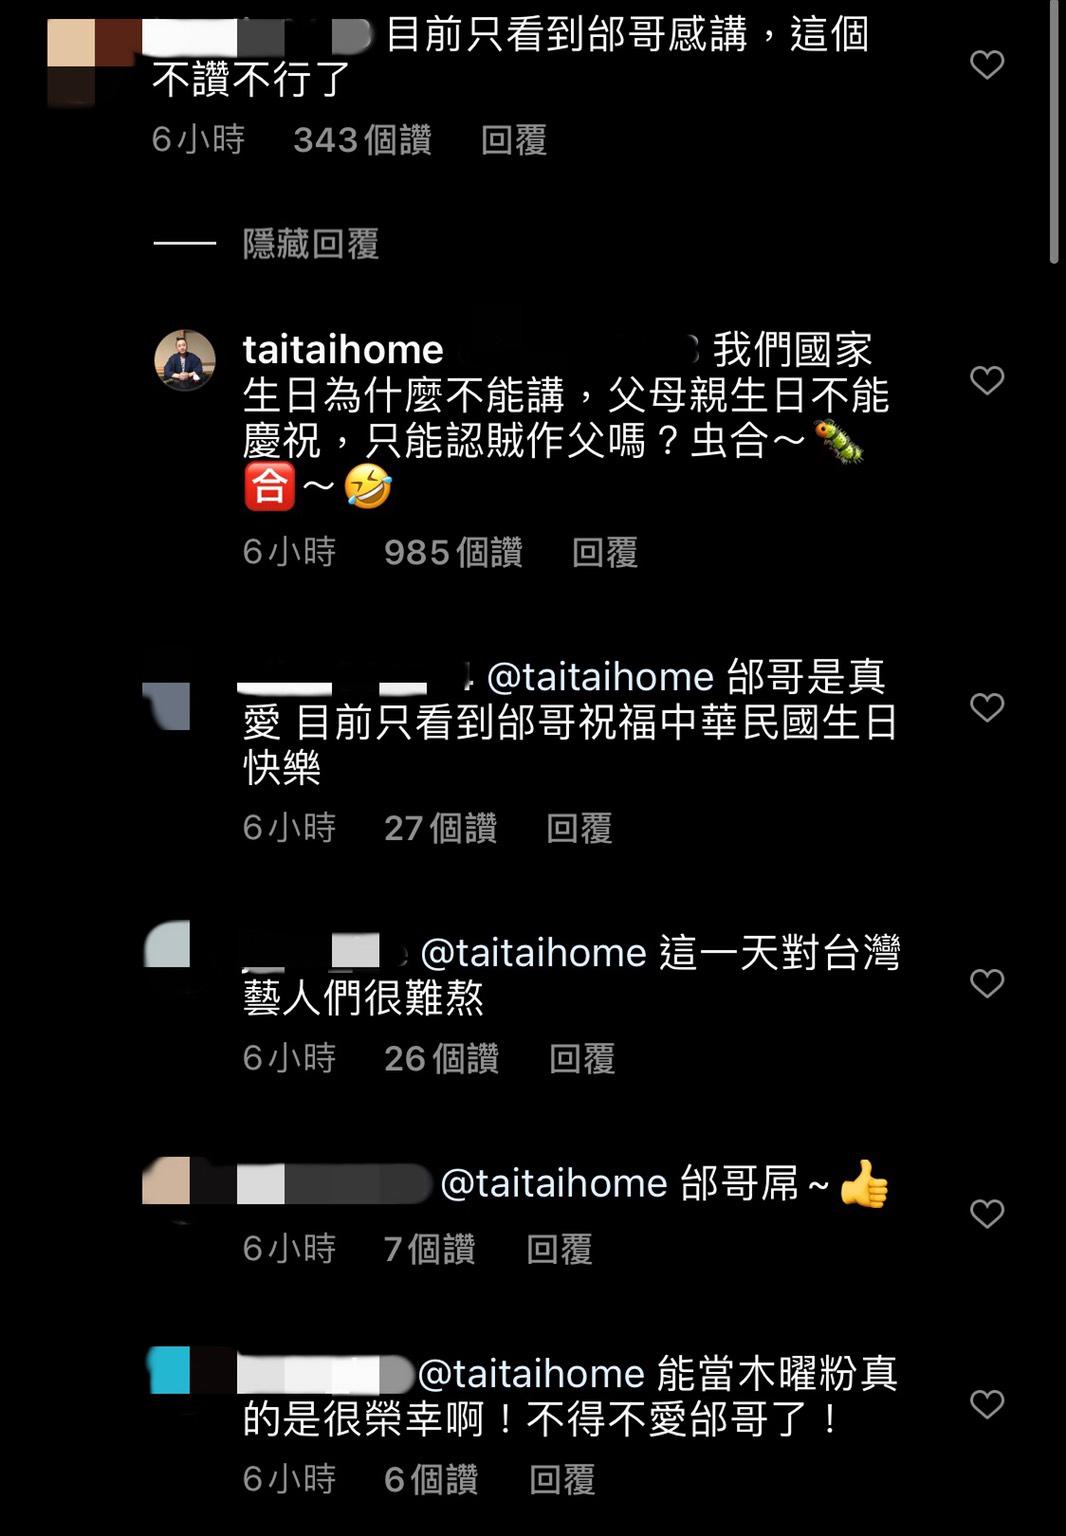 https://www.instagram.com/taitaihome/